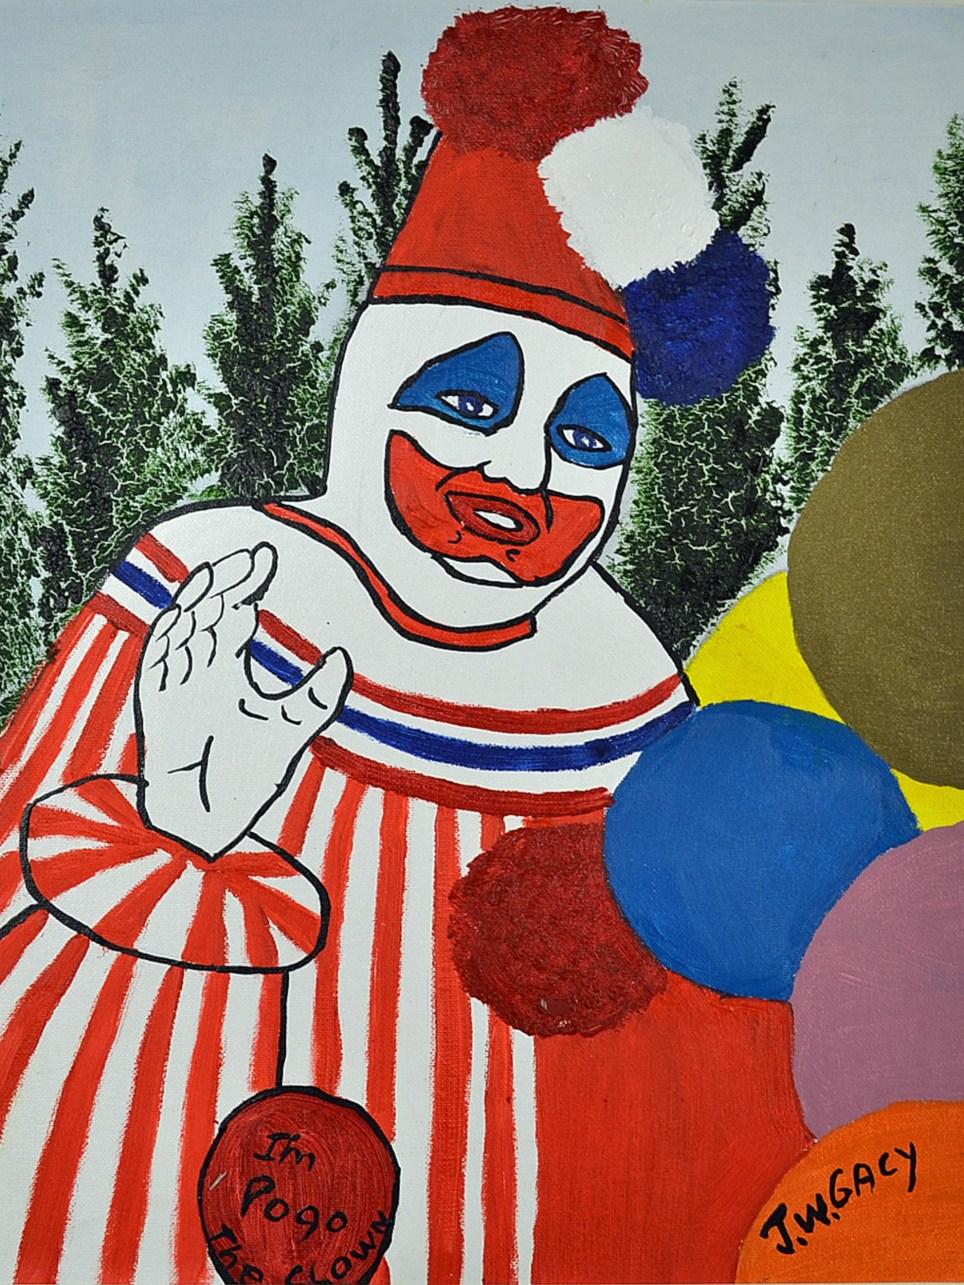 Chilling paintings by 'killer clown' John Wayne Gacy on sale